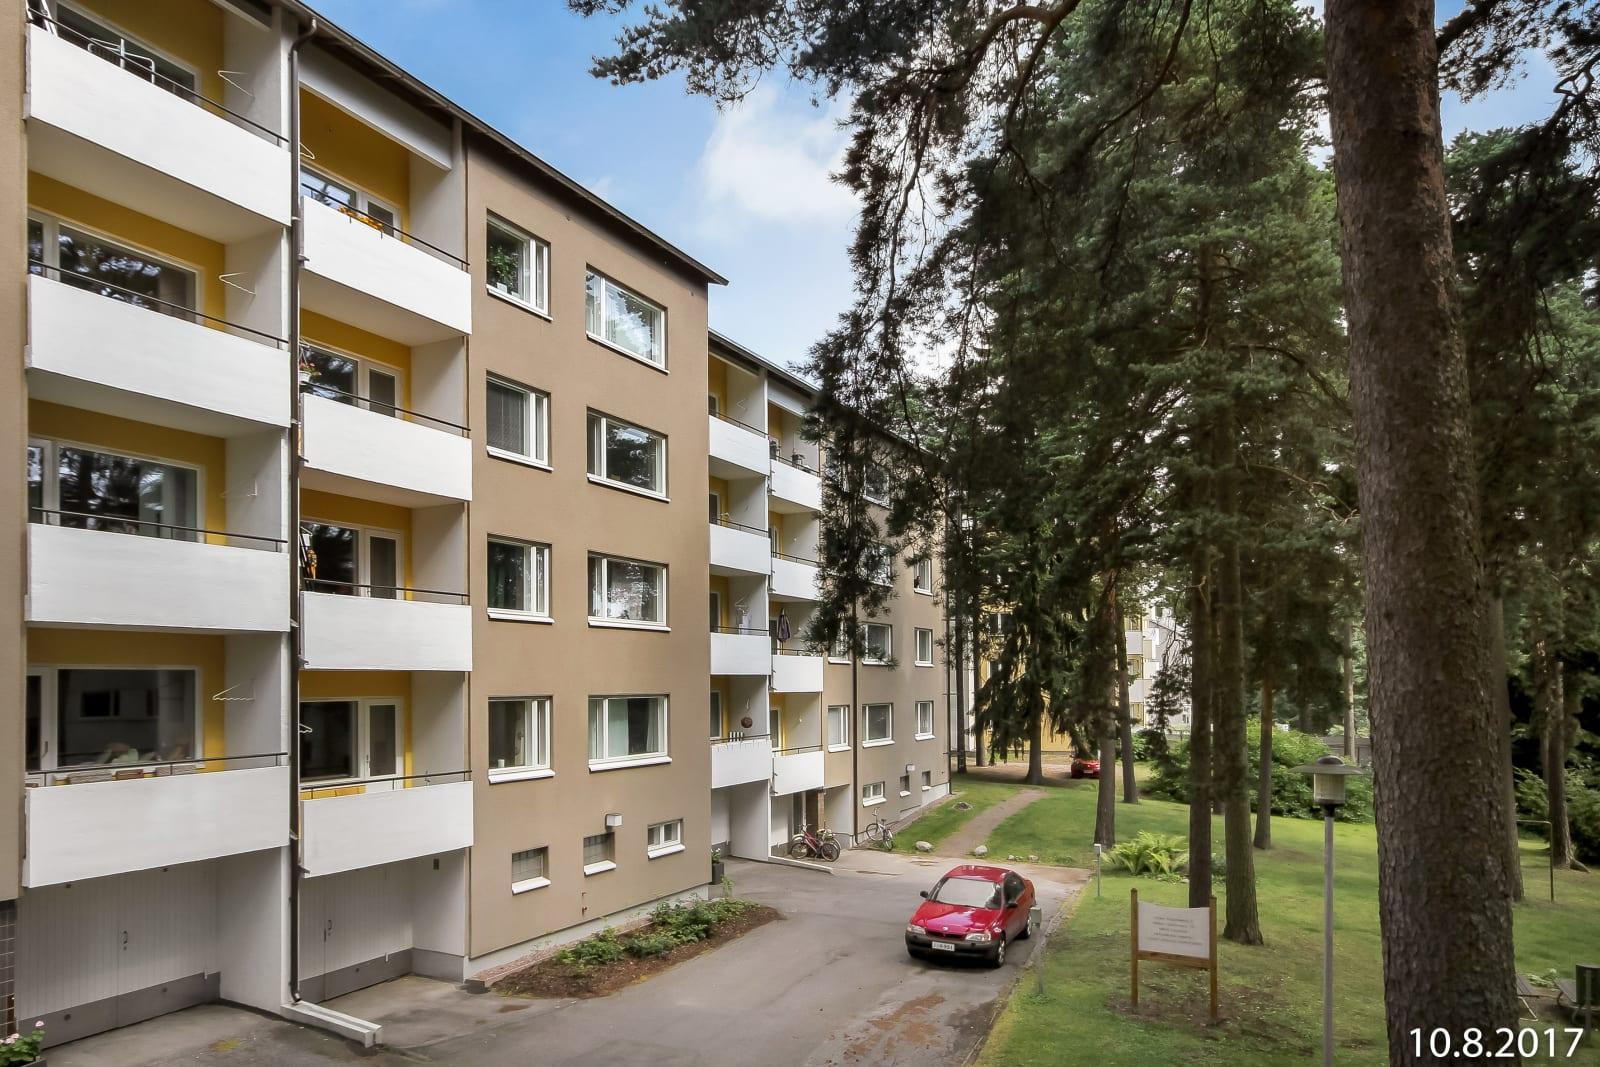 Helsinki, Pitäjänmäki, Pajamäentie 6